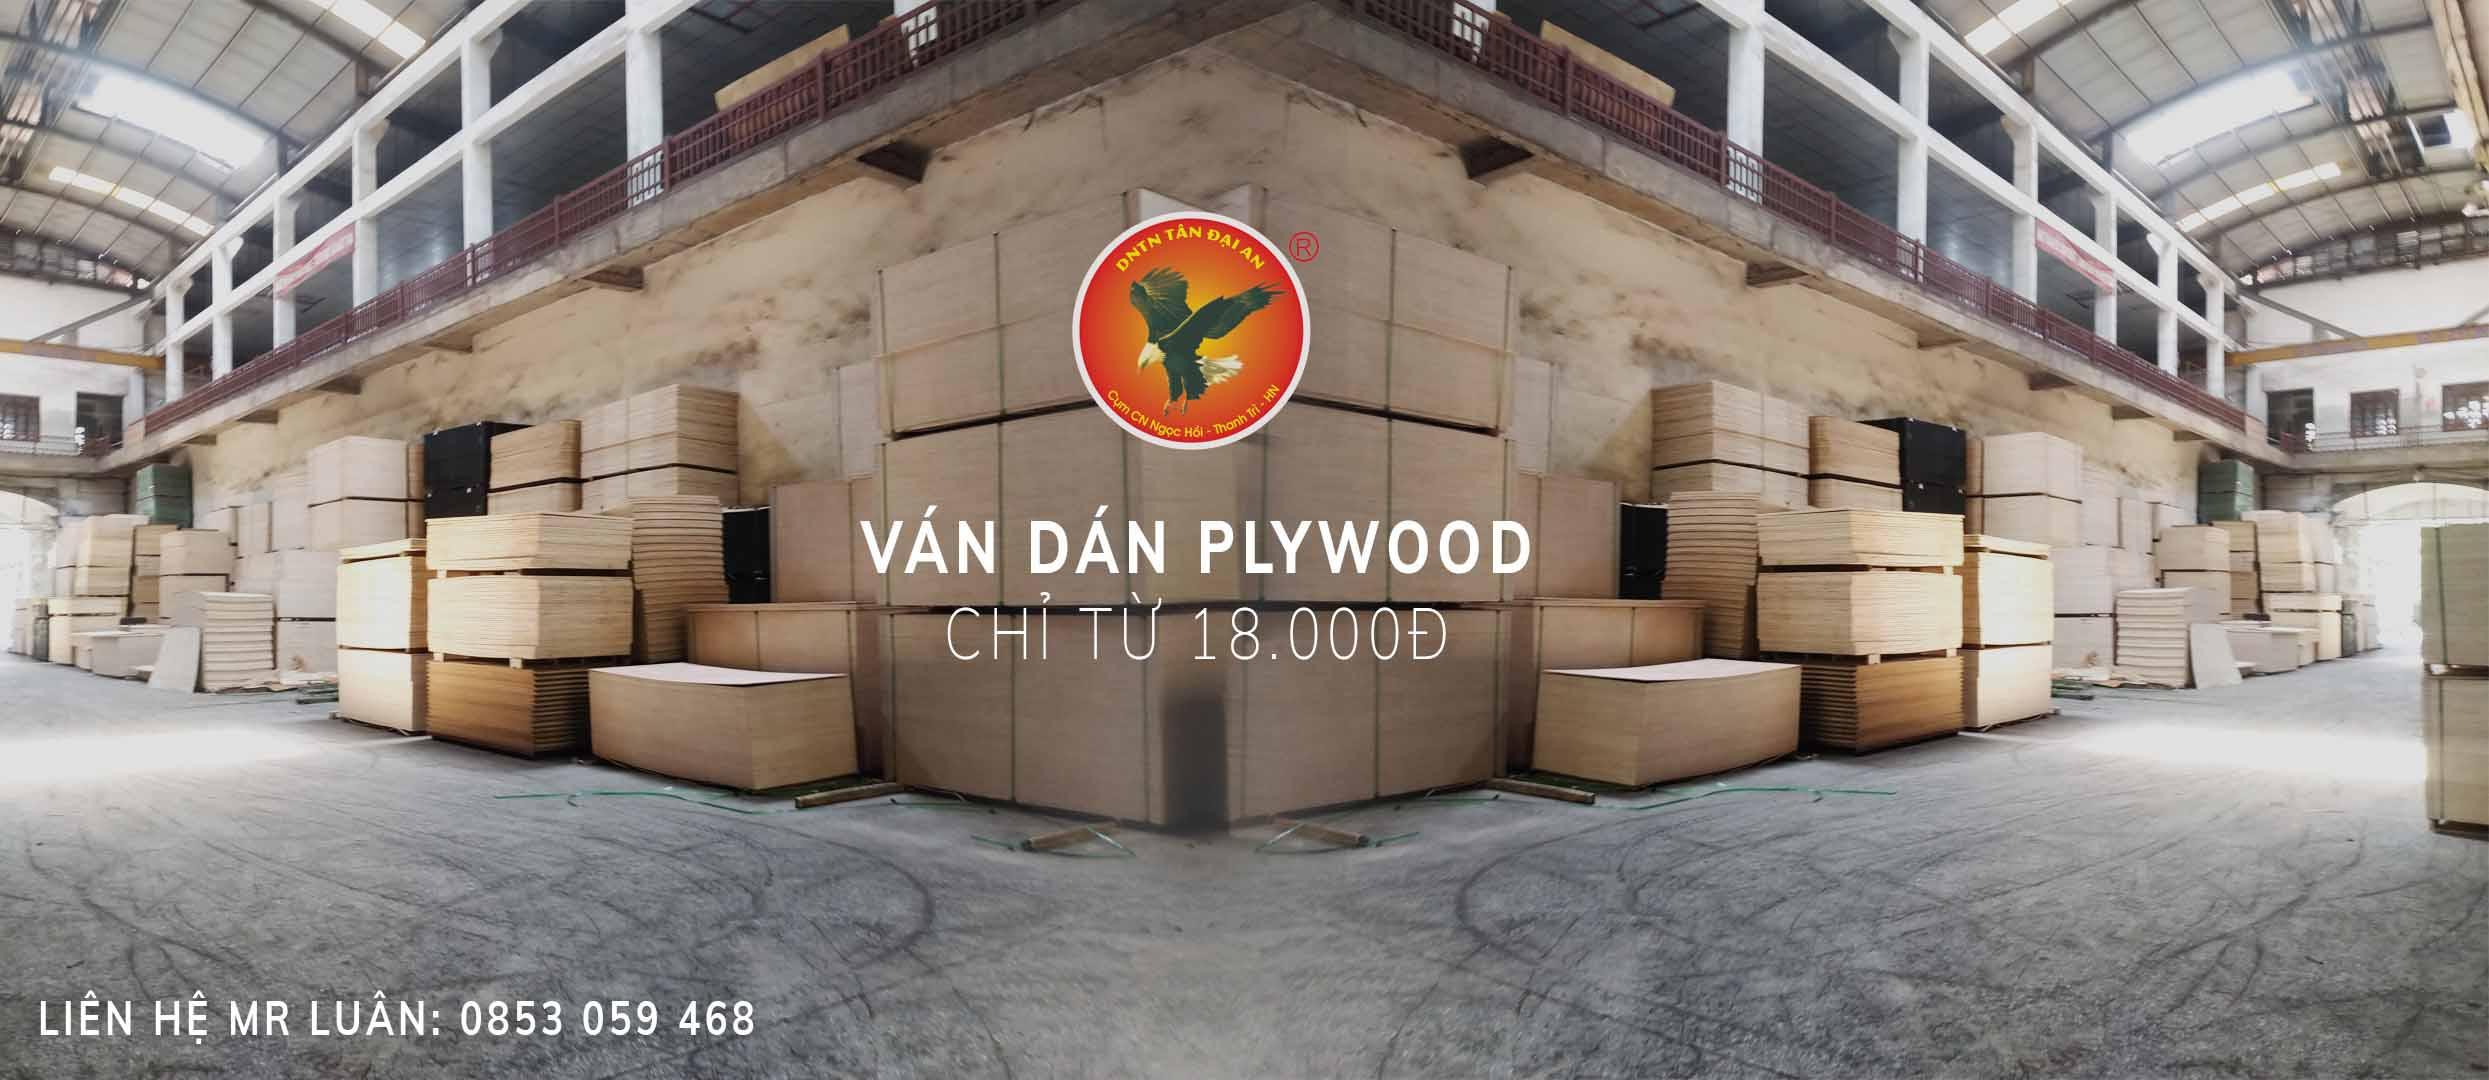 Ván gỗ dán Plywood